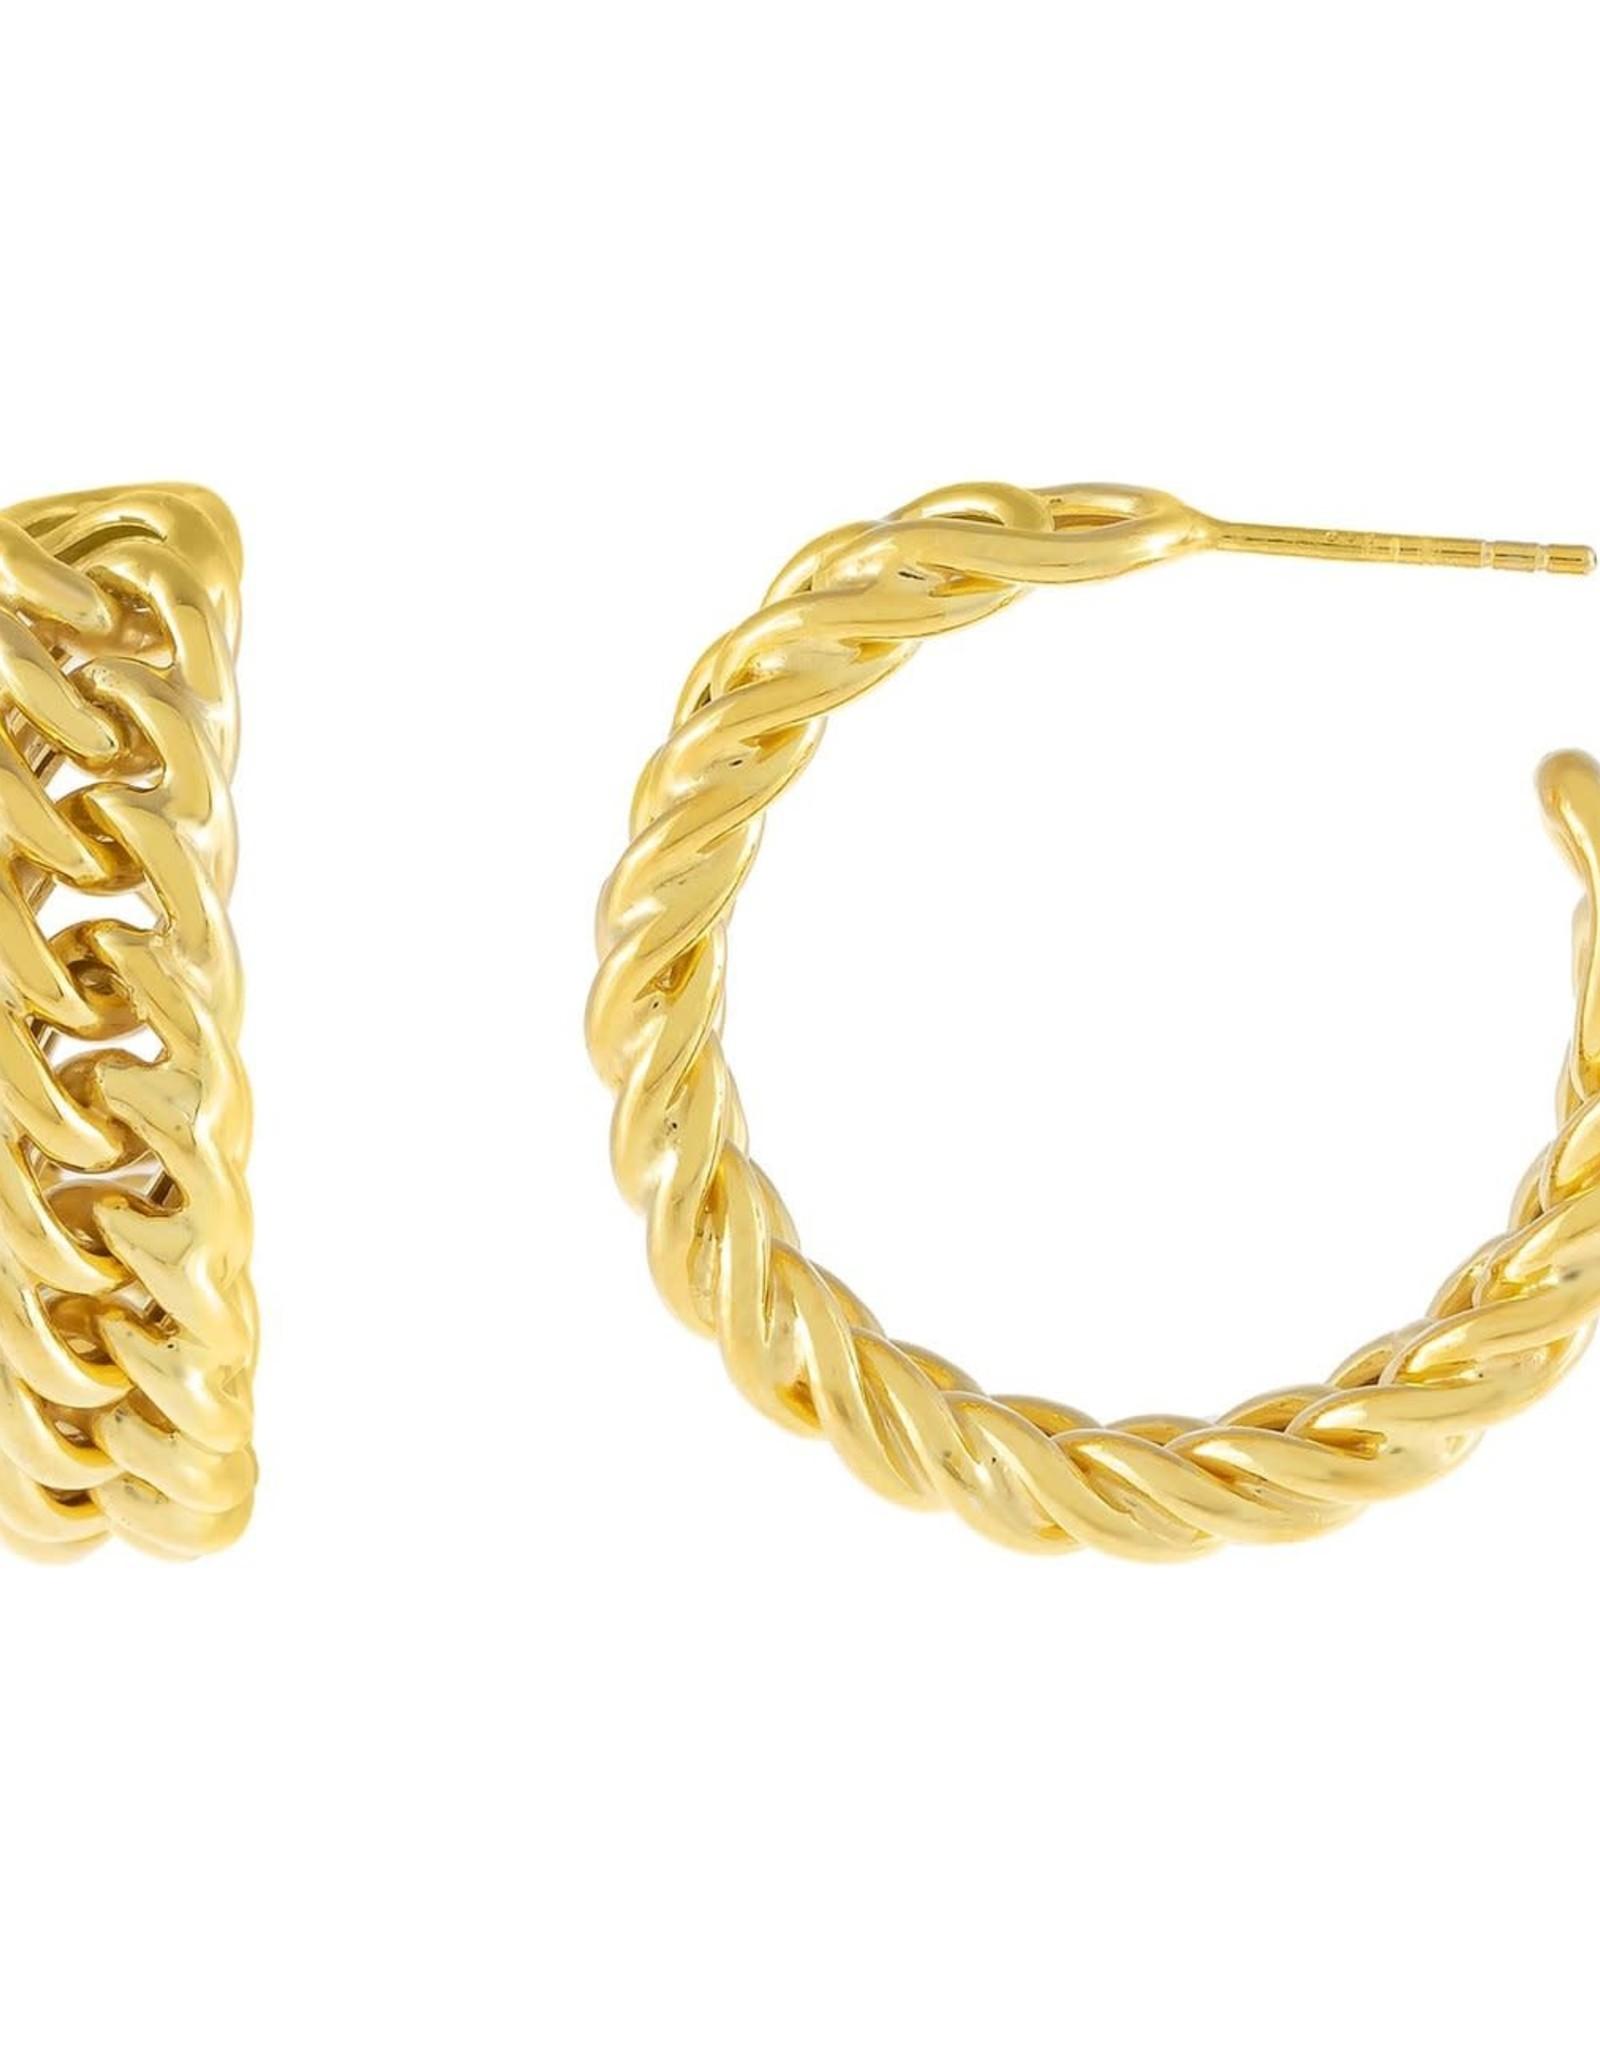 Adinas Chunky Double Curb Chain Hoops